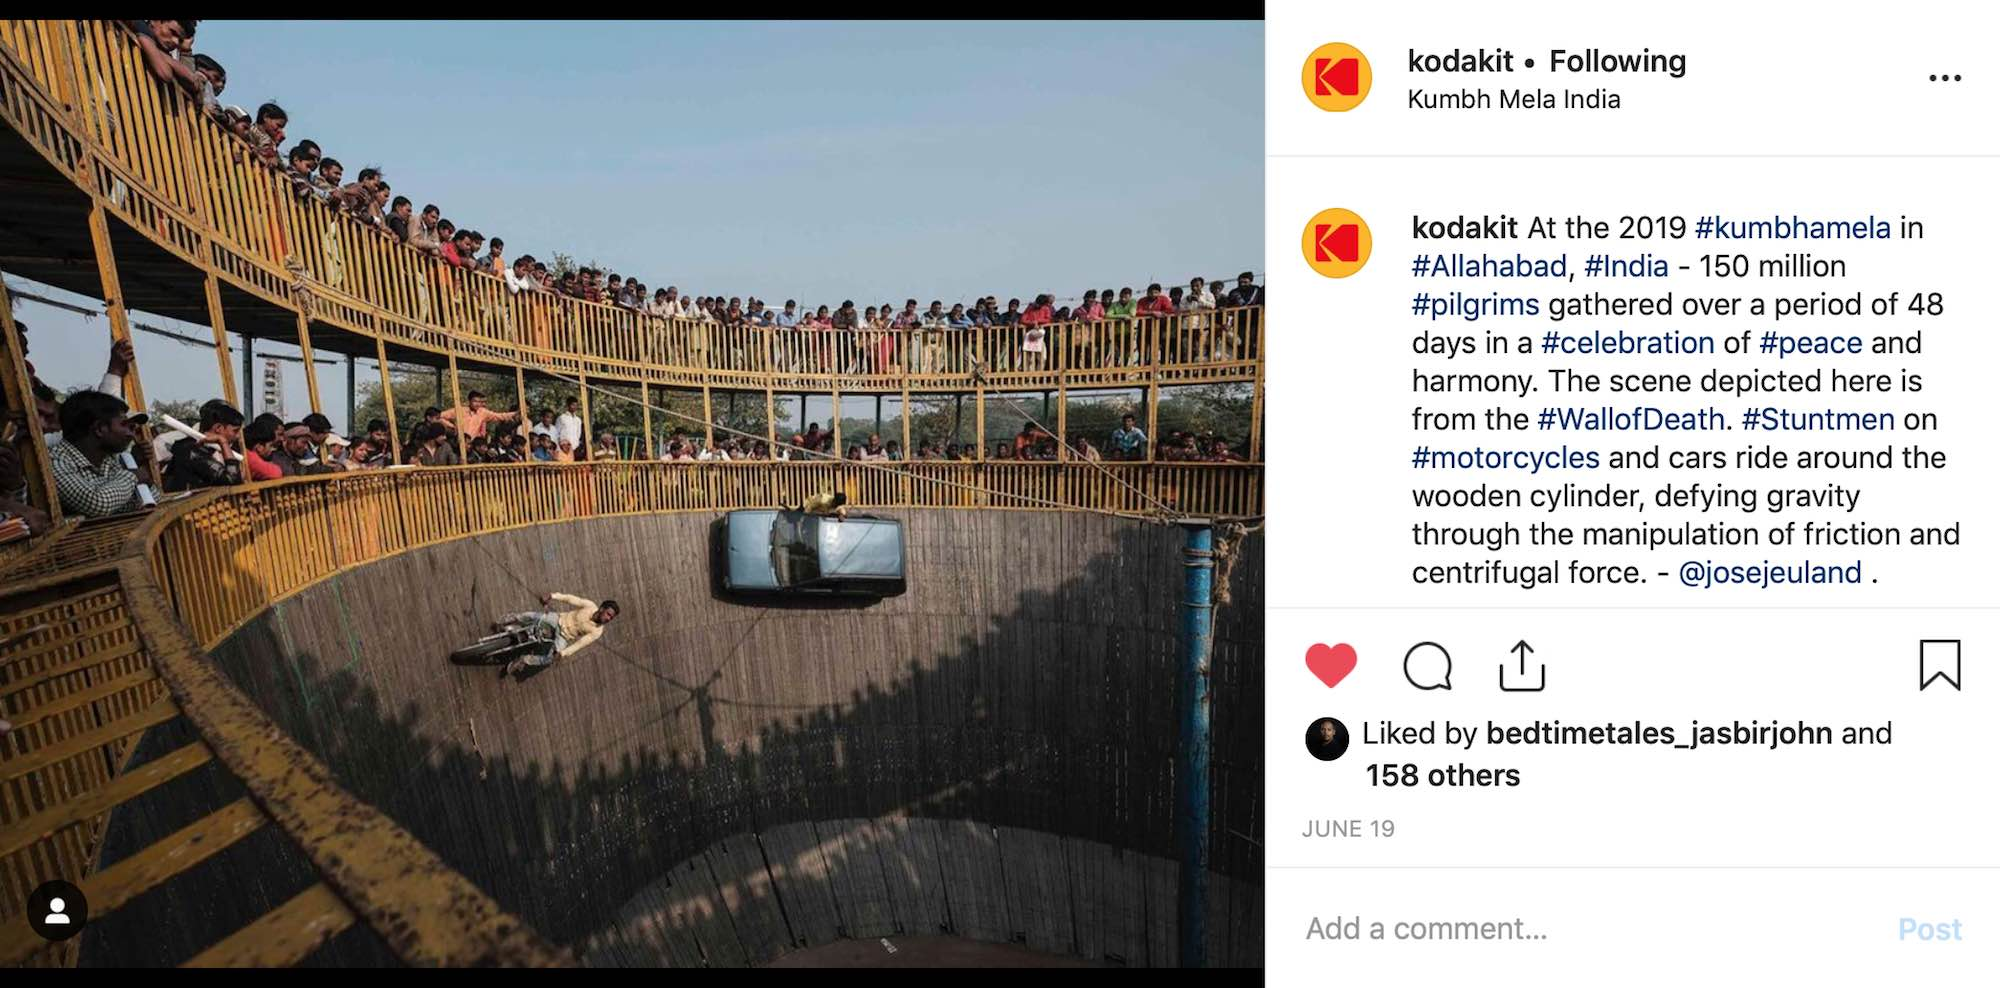 Kodakit kodak jose jeuland documentary commercial photographer singapore asia india copy